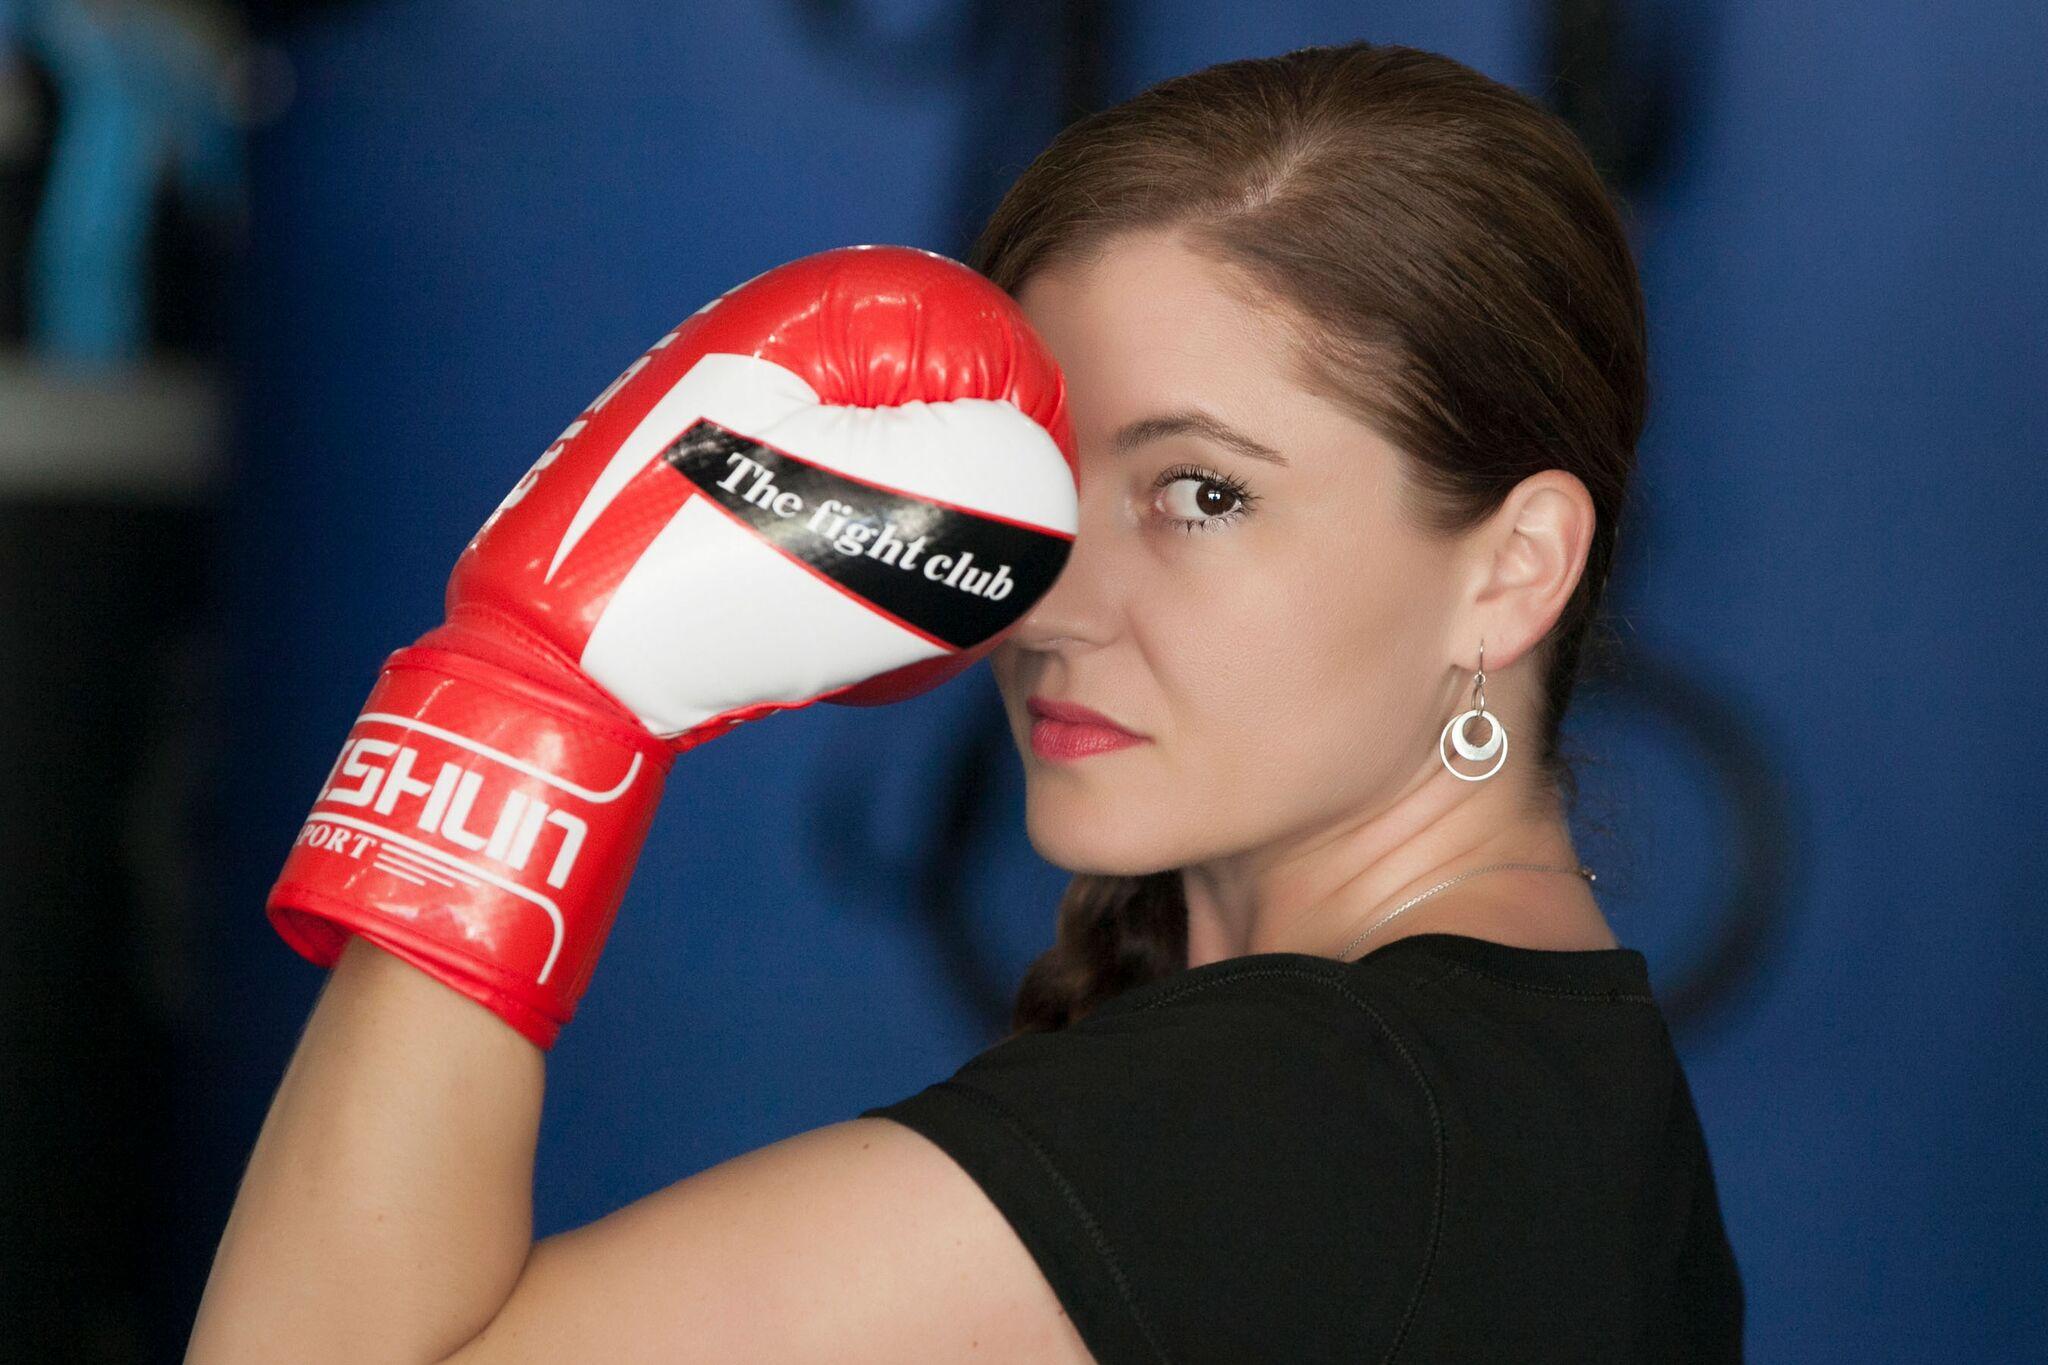 s 360 A boxing.jpg